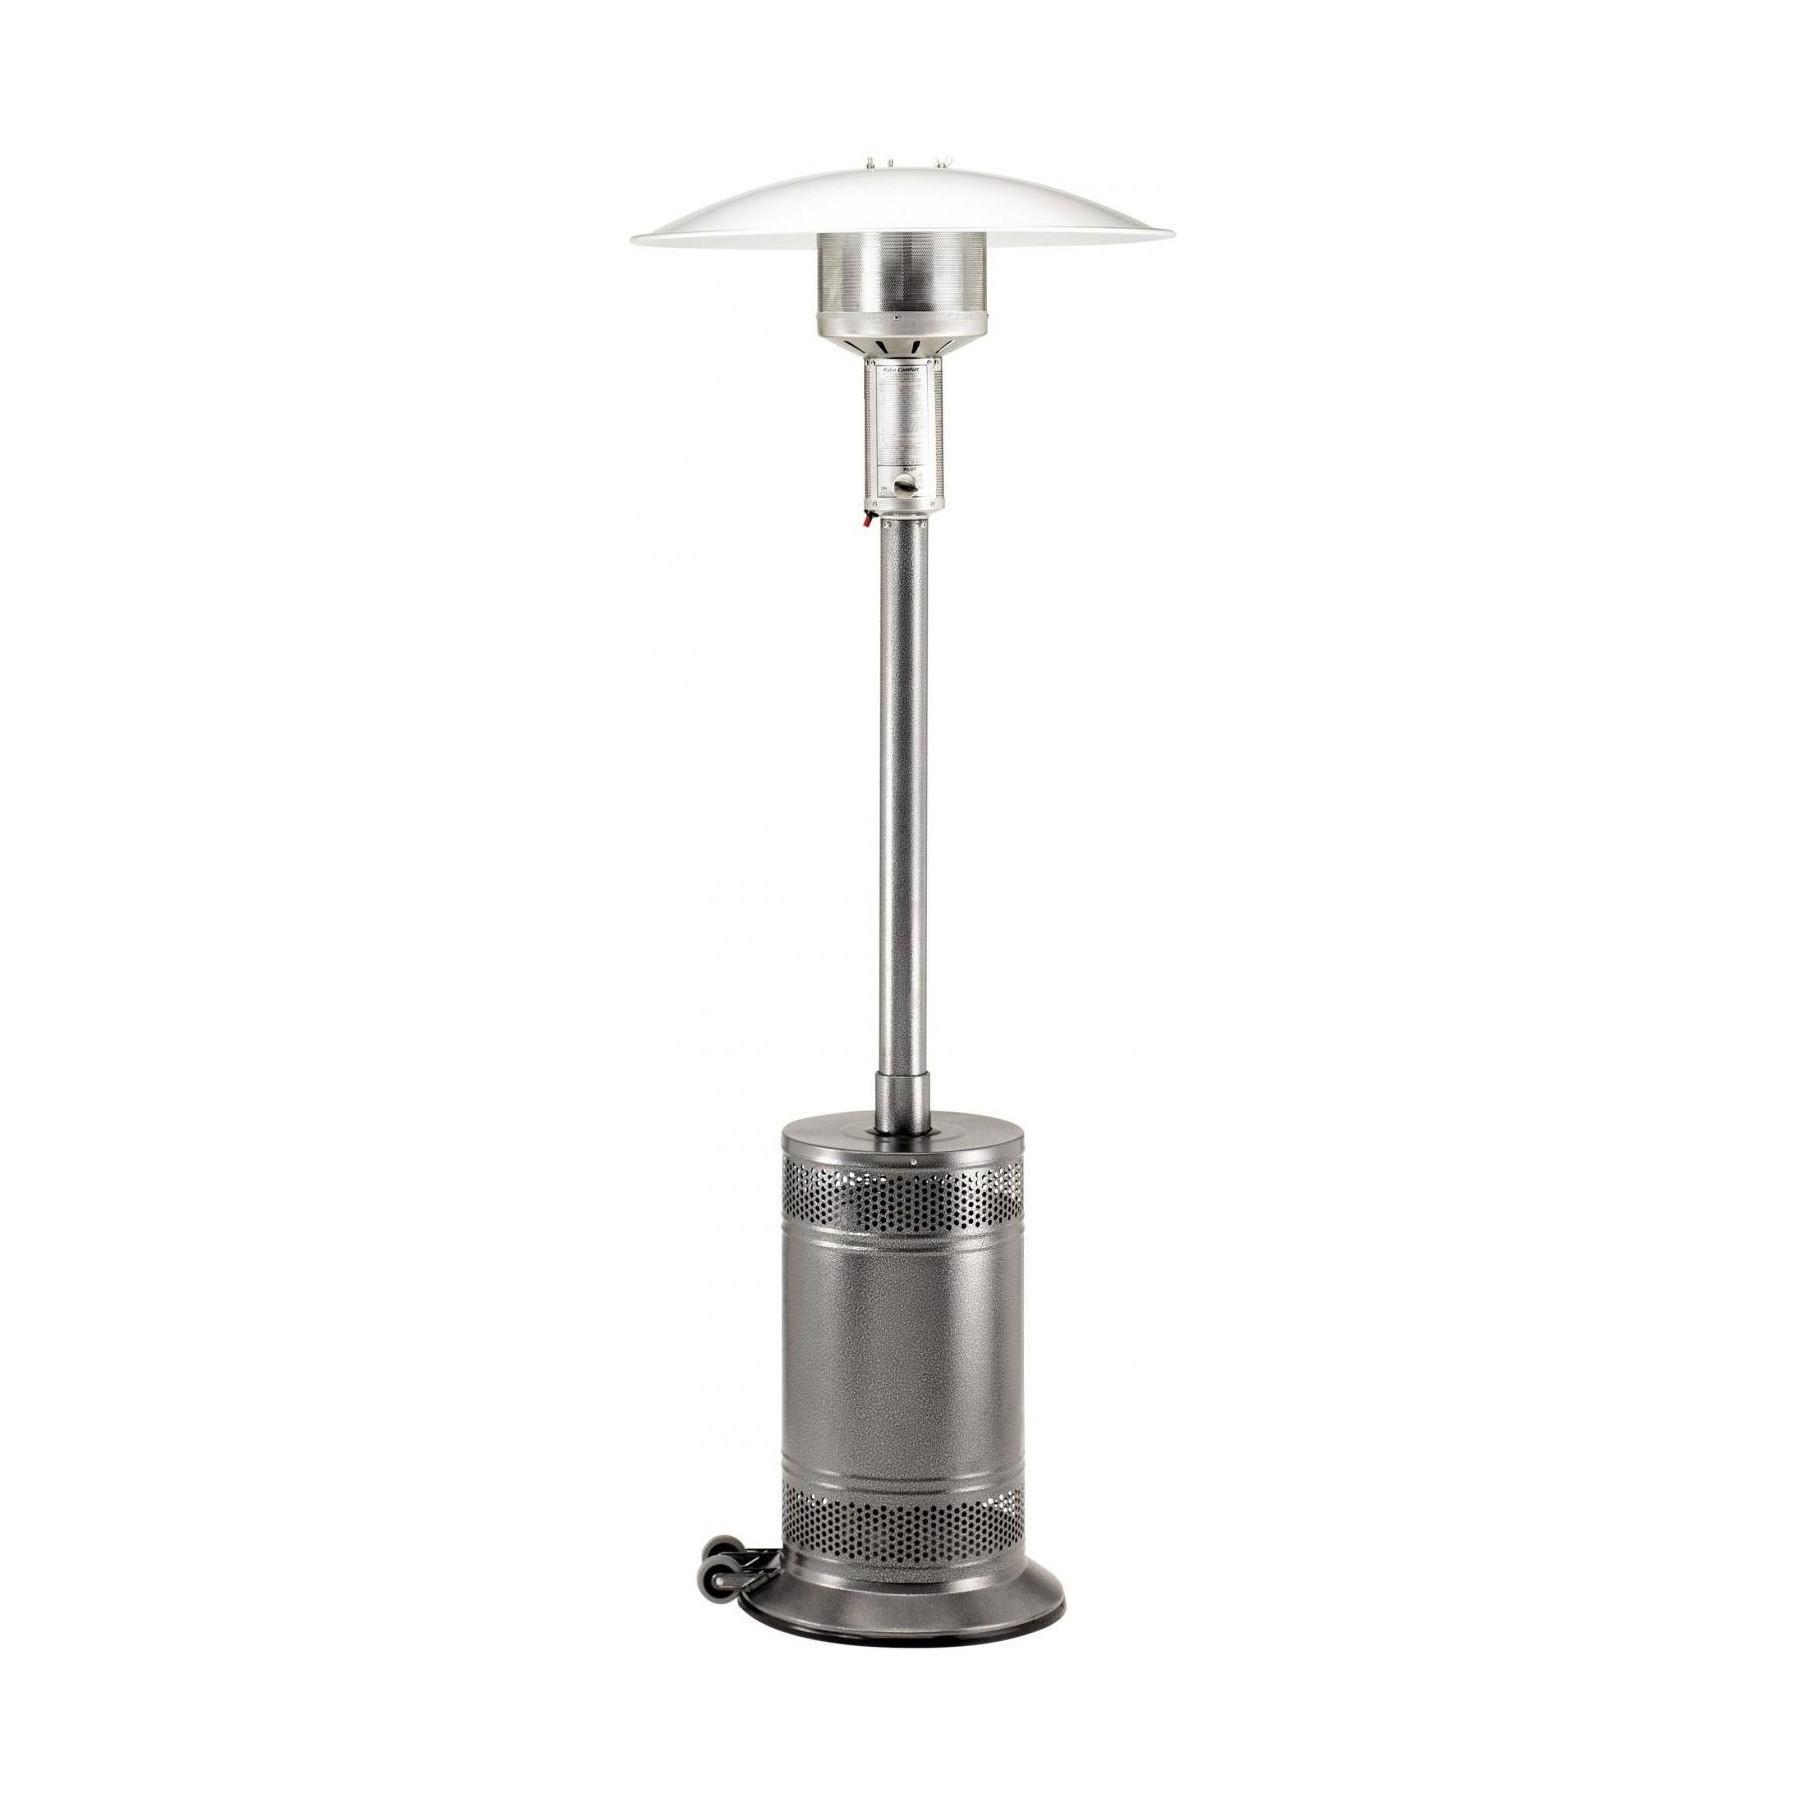 Aei Patio Comfort Portable Jetsilver Vein Patio Heater Propane with regard to dimensions 1800 X 1800